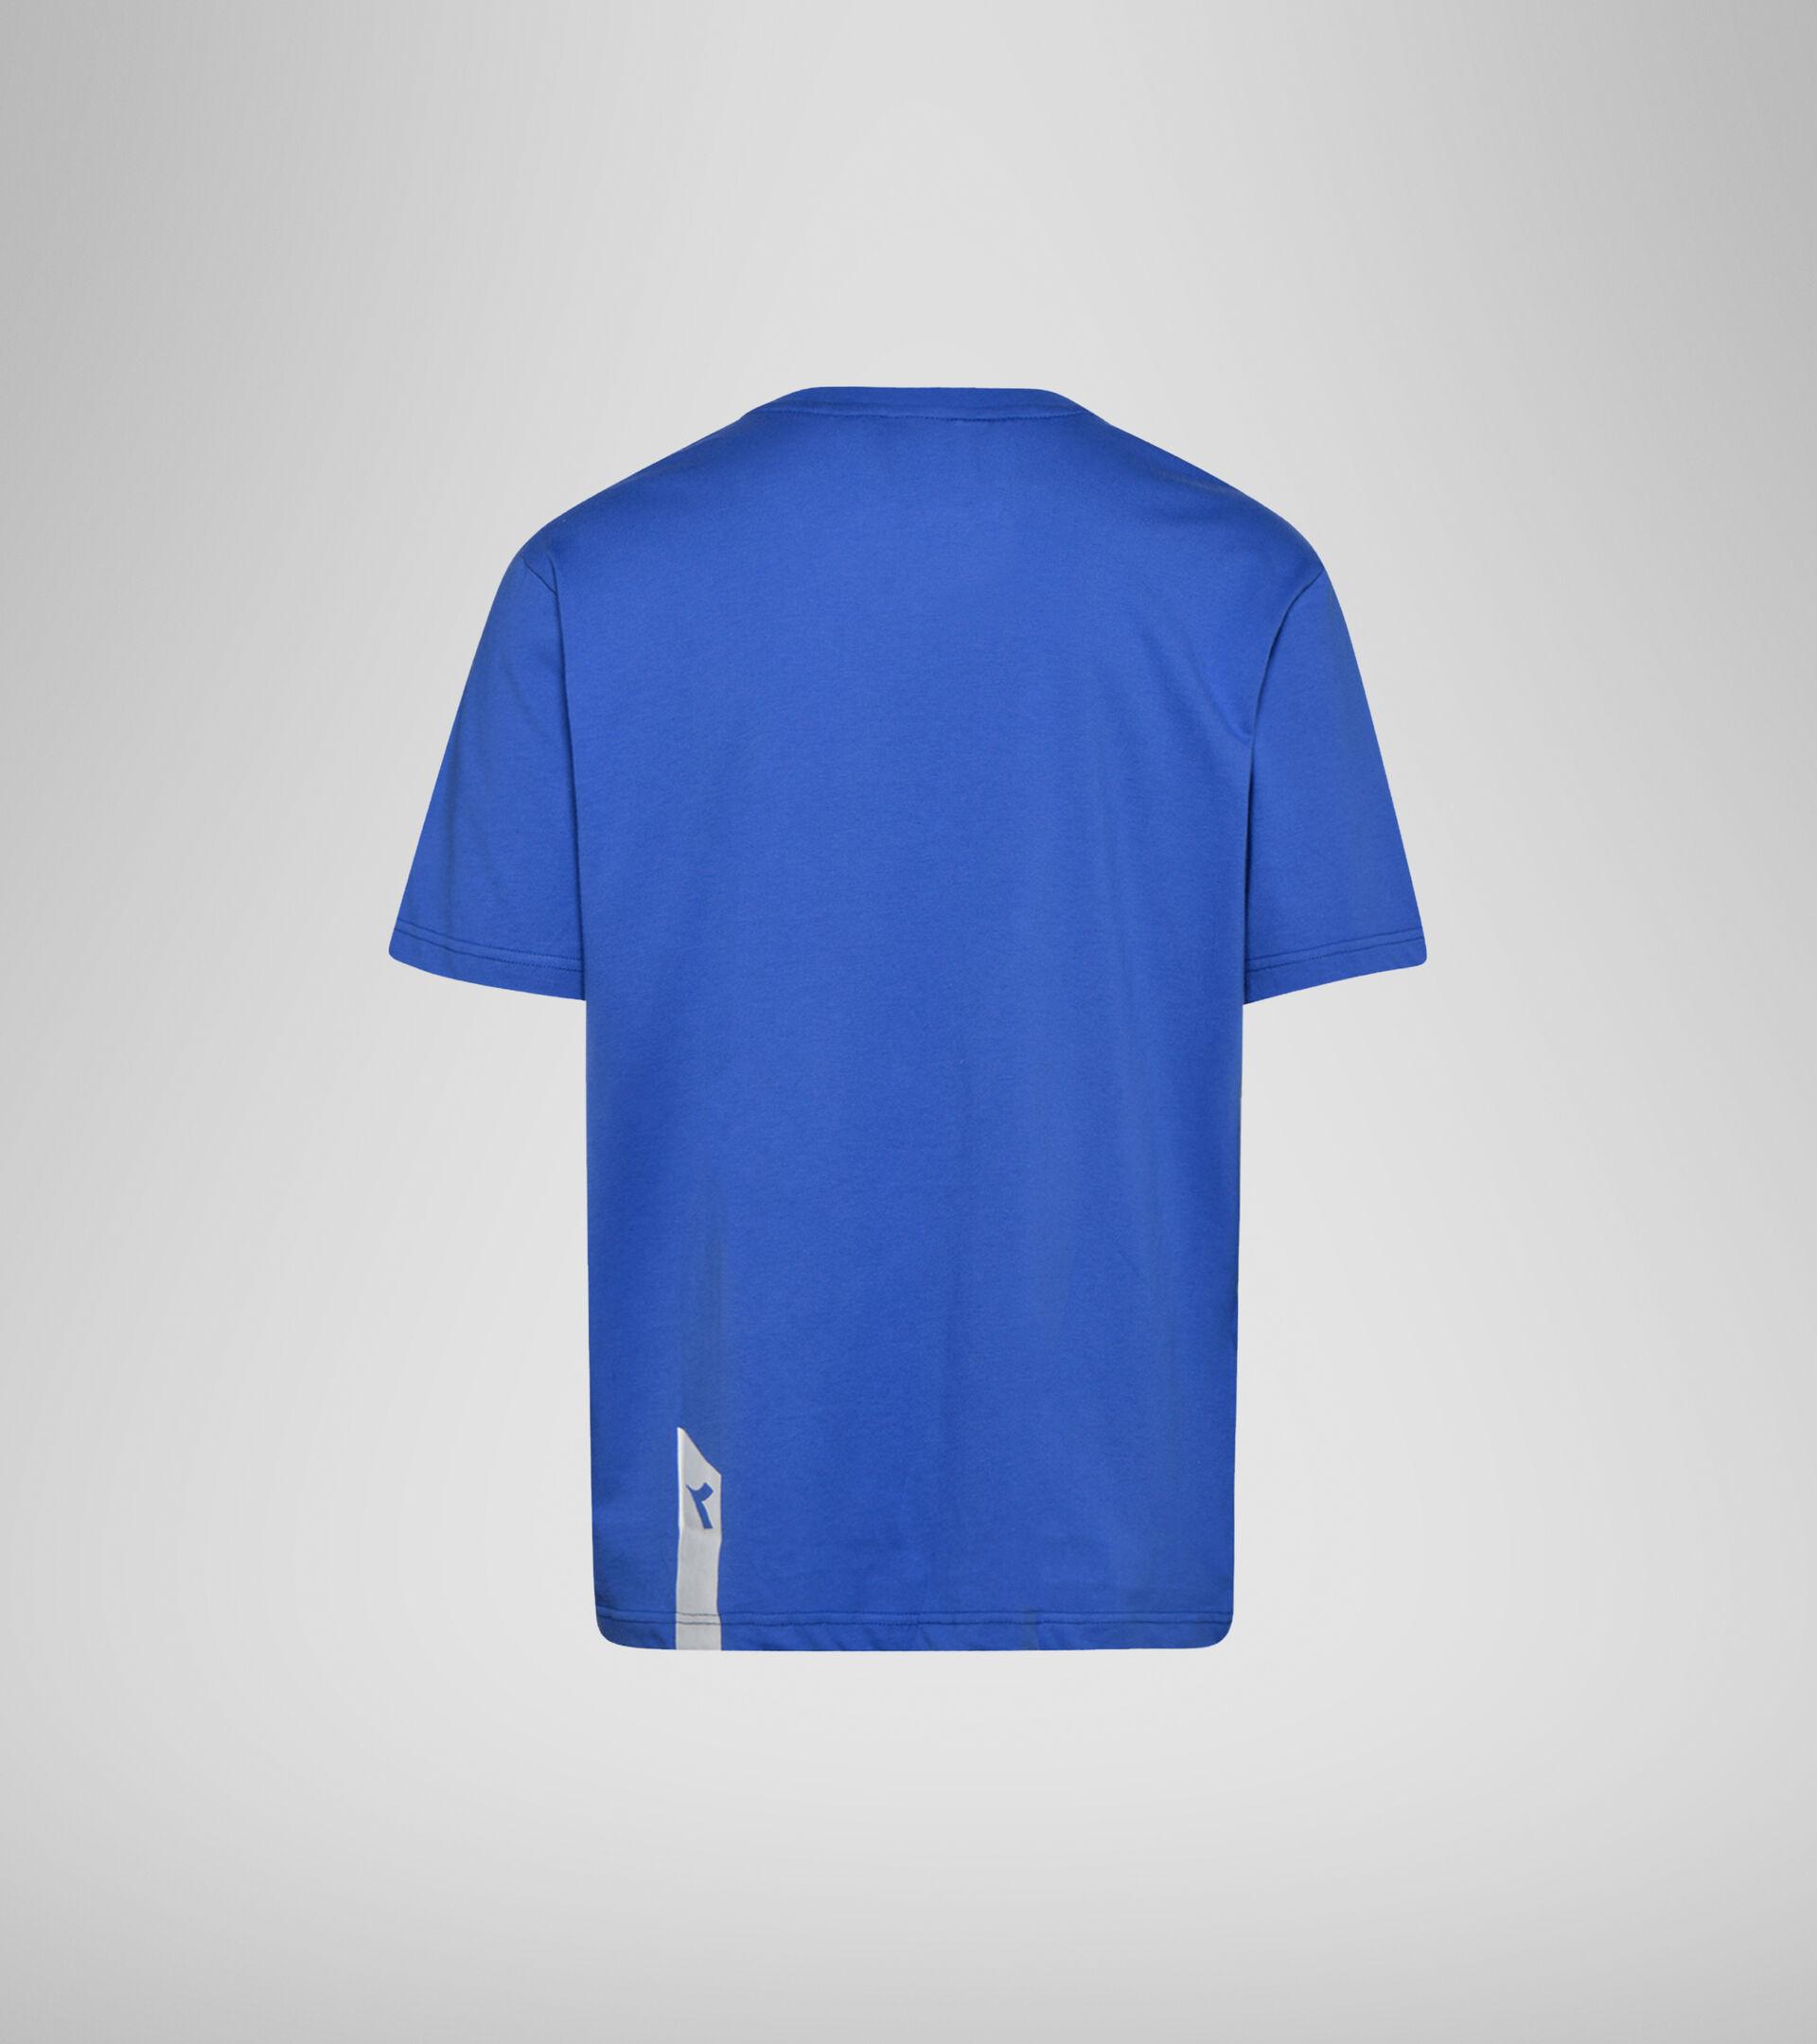 T-shirt - Unisex T-SHIRT SS ICON BLUE PERSIA - Diadora